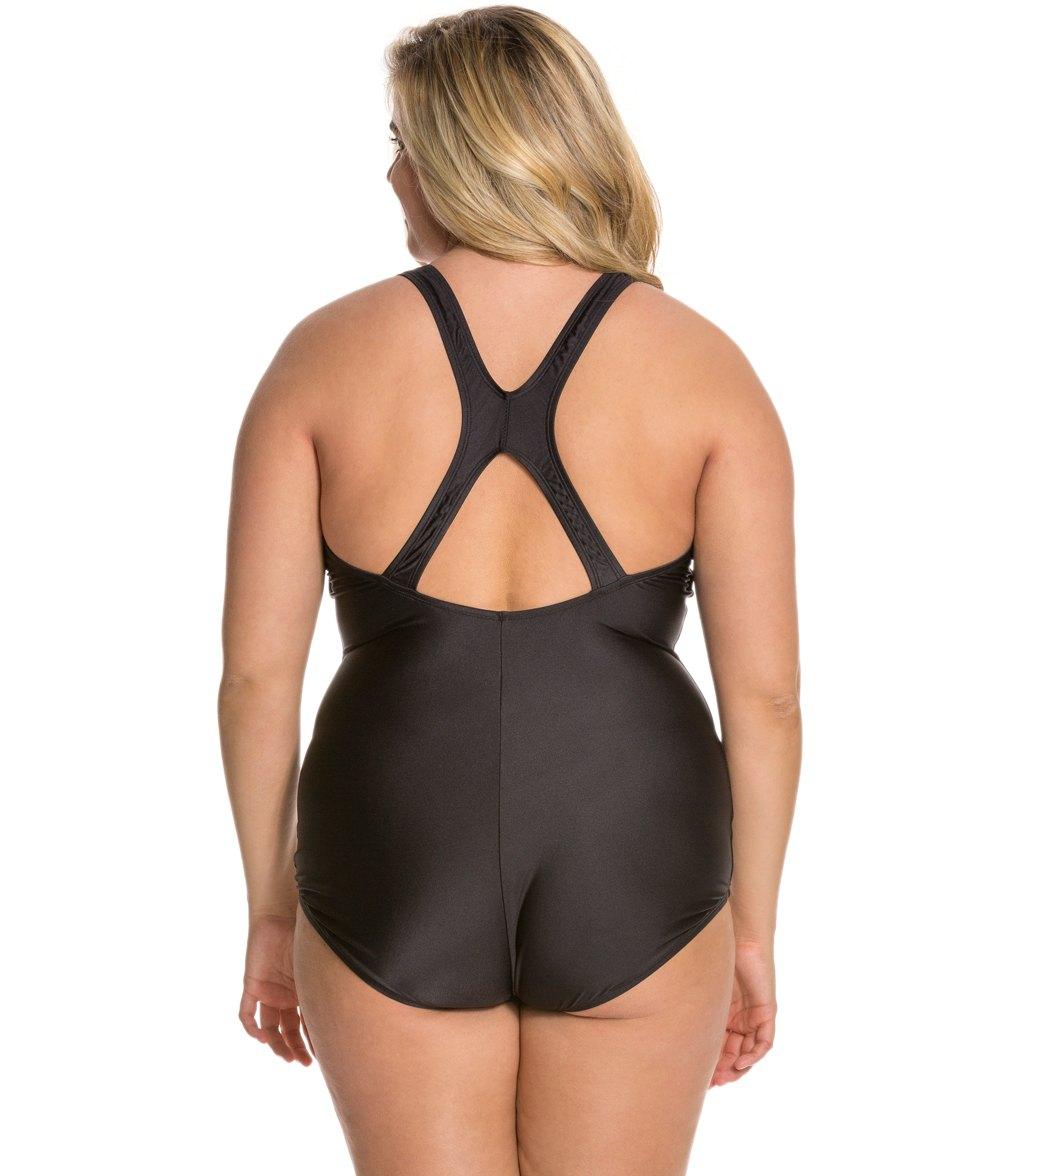 5e29d7fd8e Speedo Conservative Ultraback Plus Size Chlorine Resistant One Piece  Swimsuit